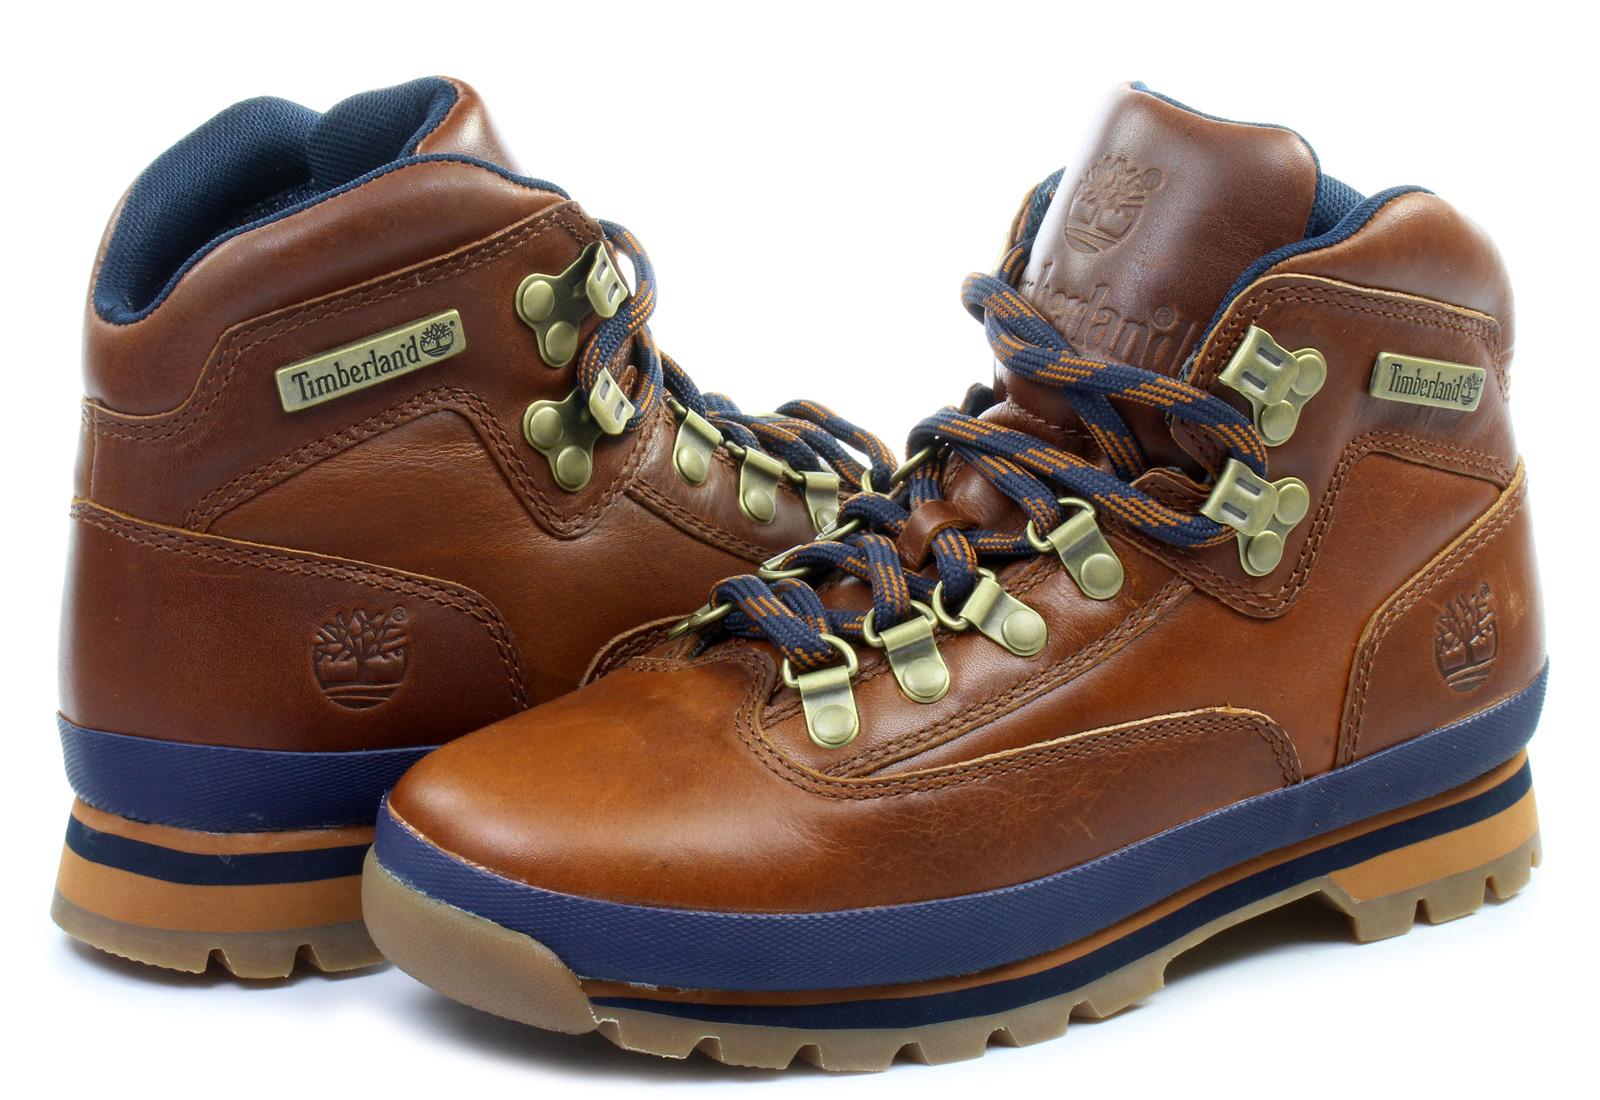 Timberland Topánky - Euro Hiker Leather - 8250A-BRN - Tenisky ... 0fc7612cc6e